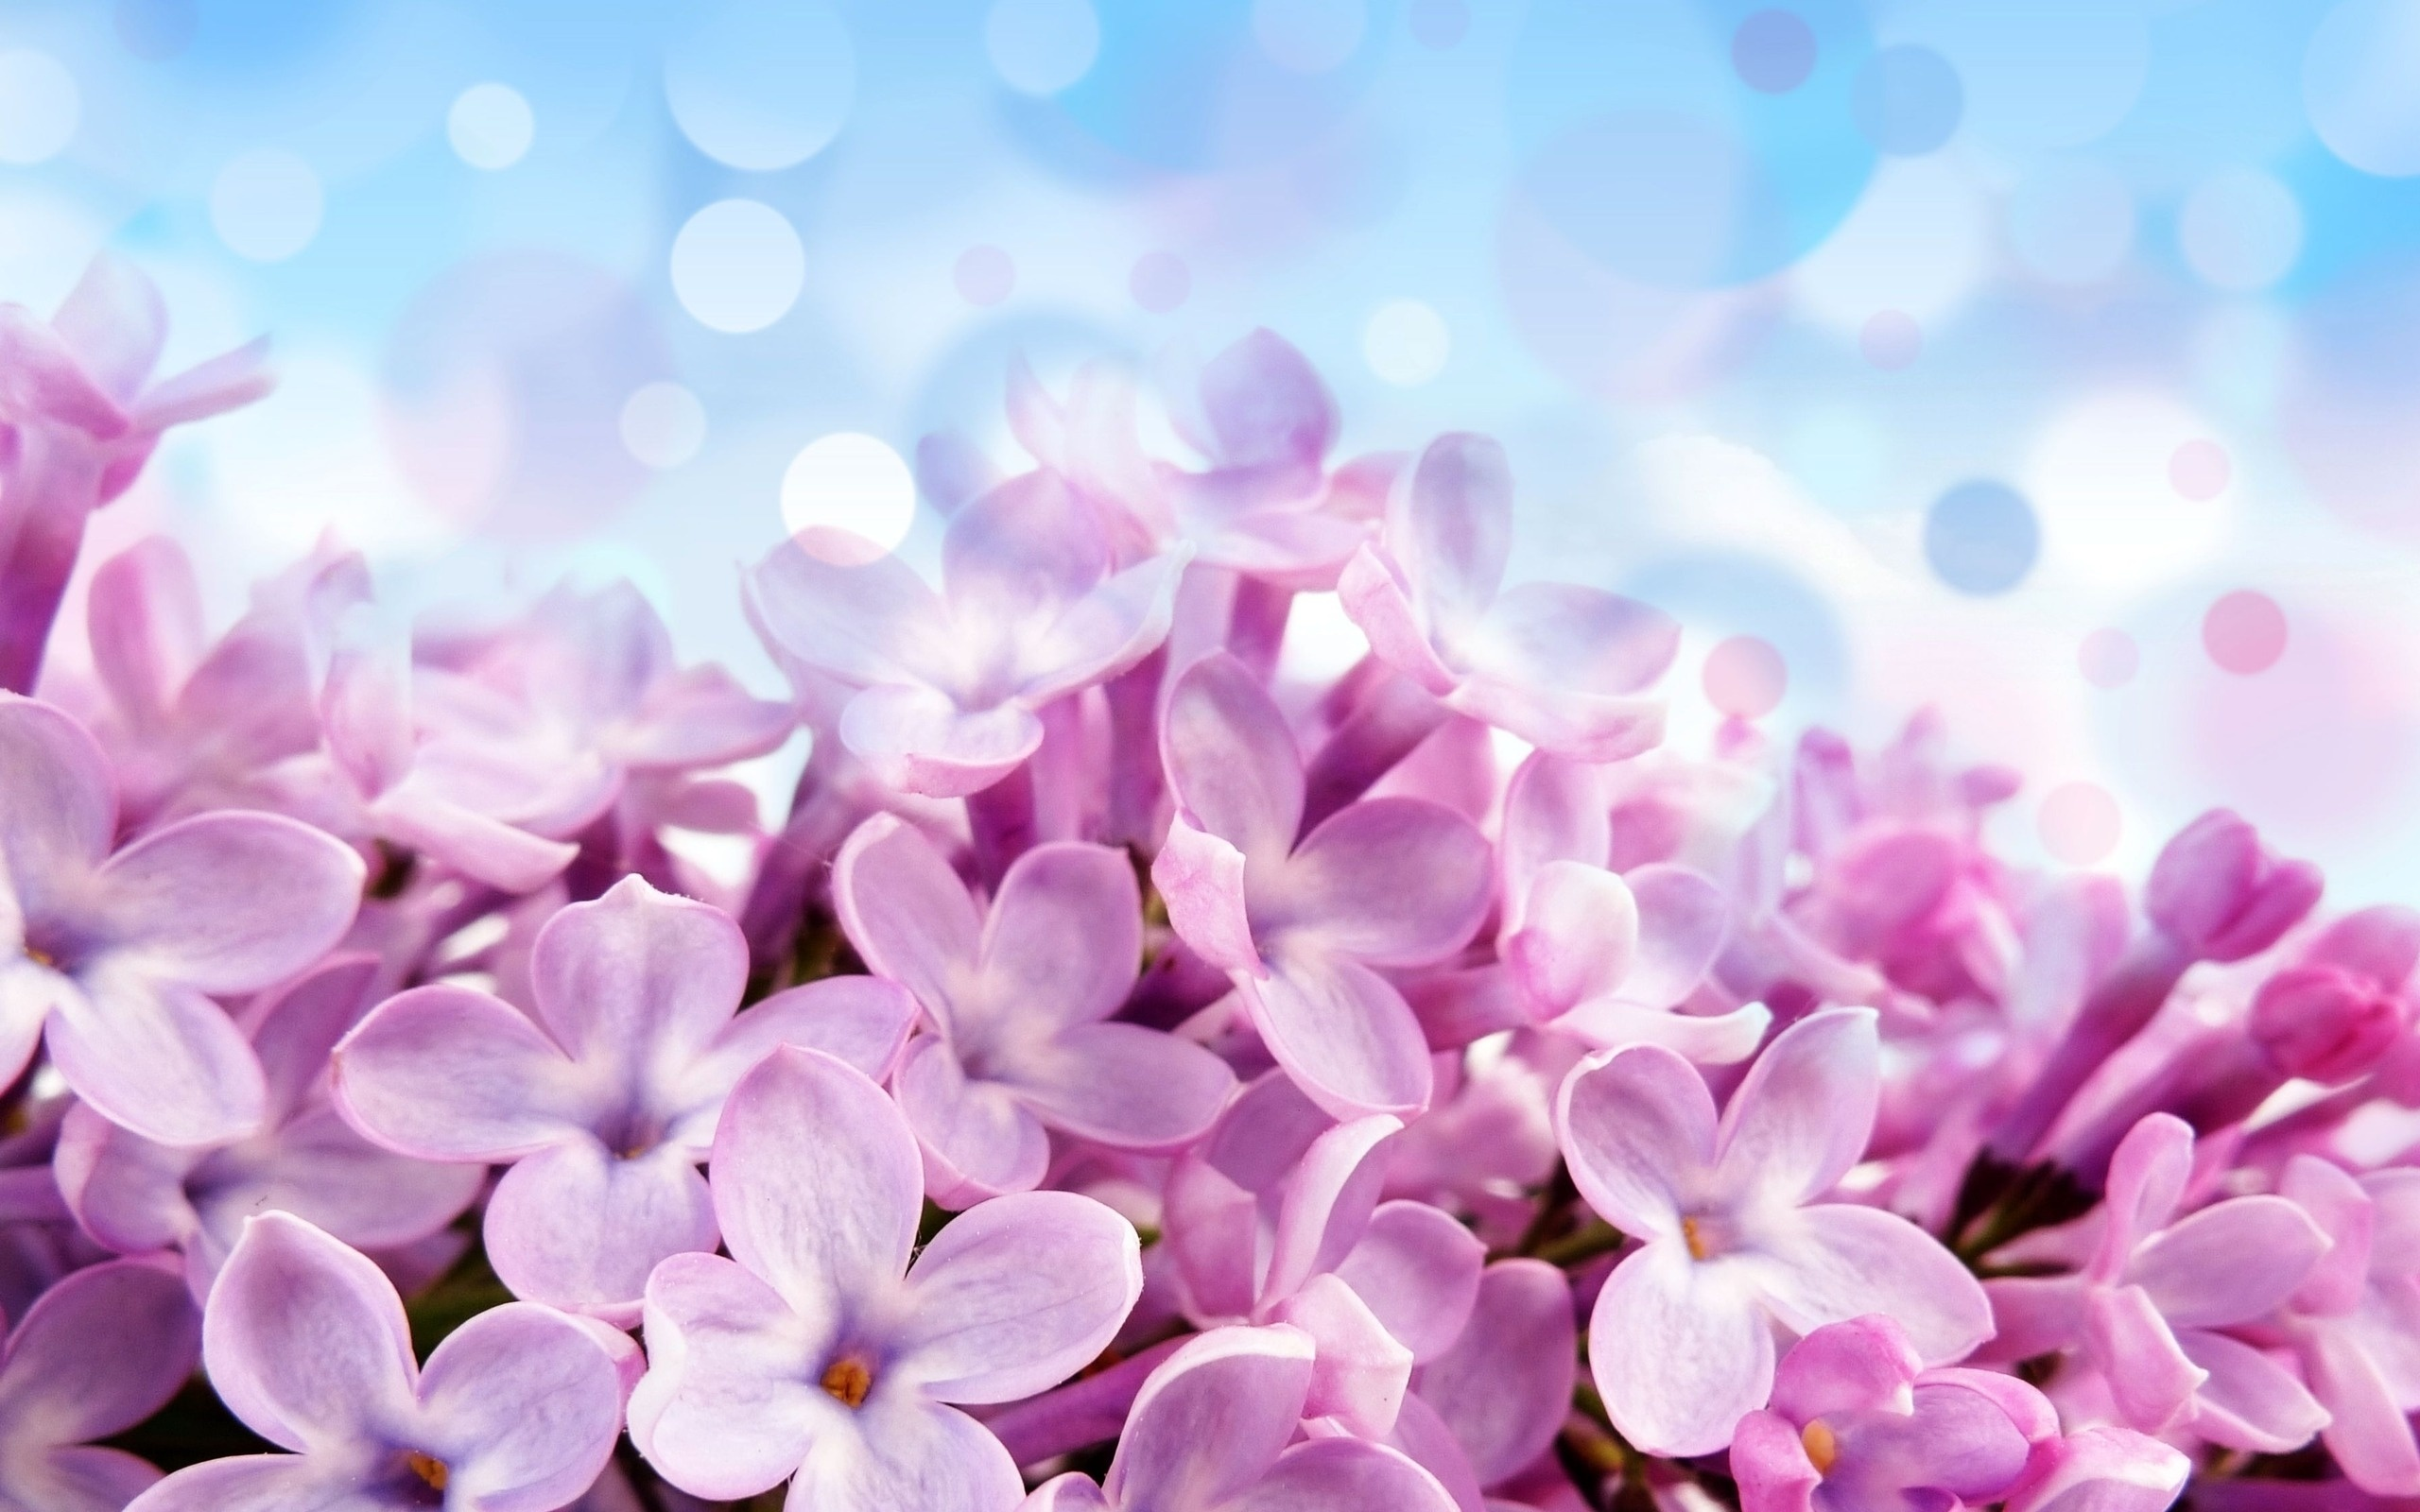 download wallpaper 1024x600 lilac - photo #9